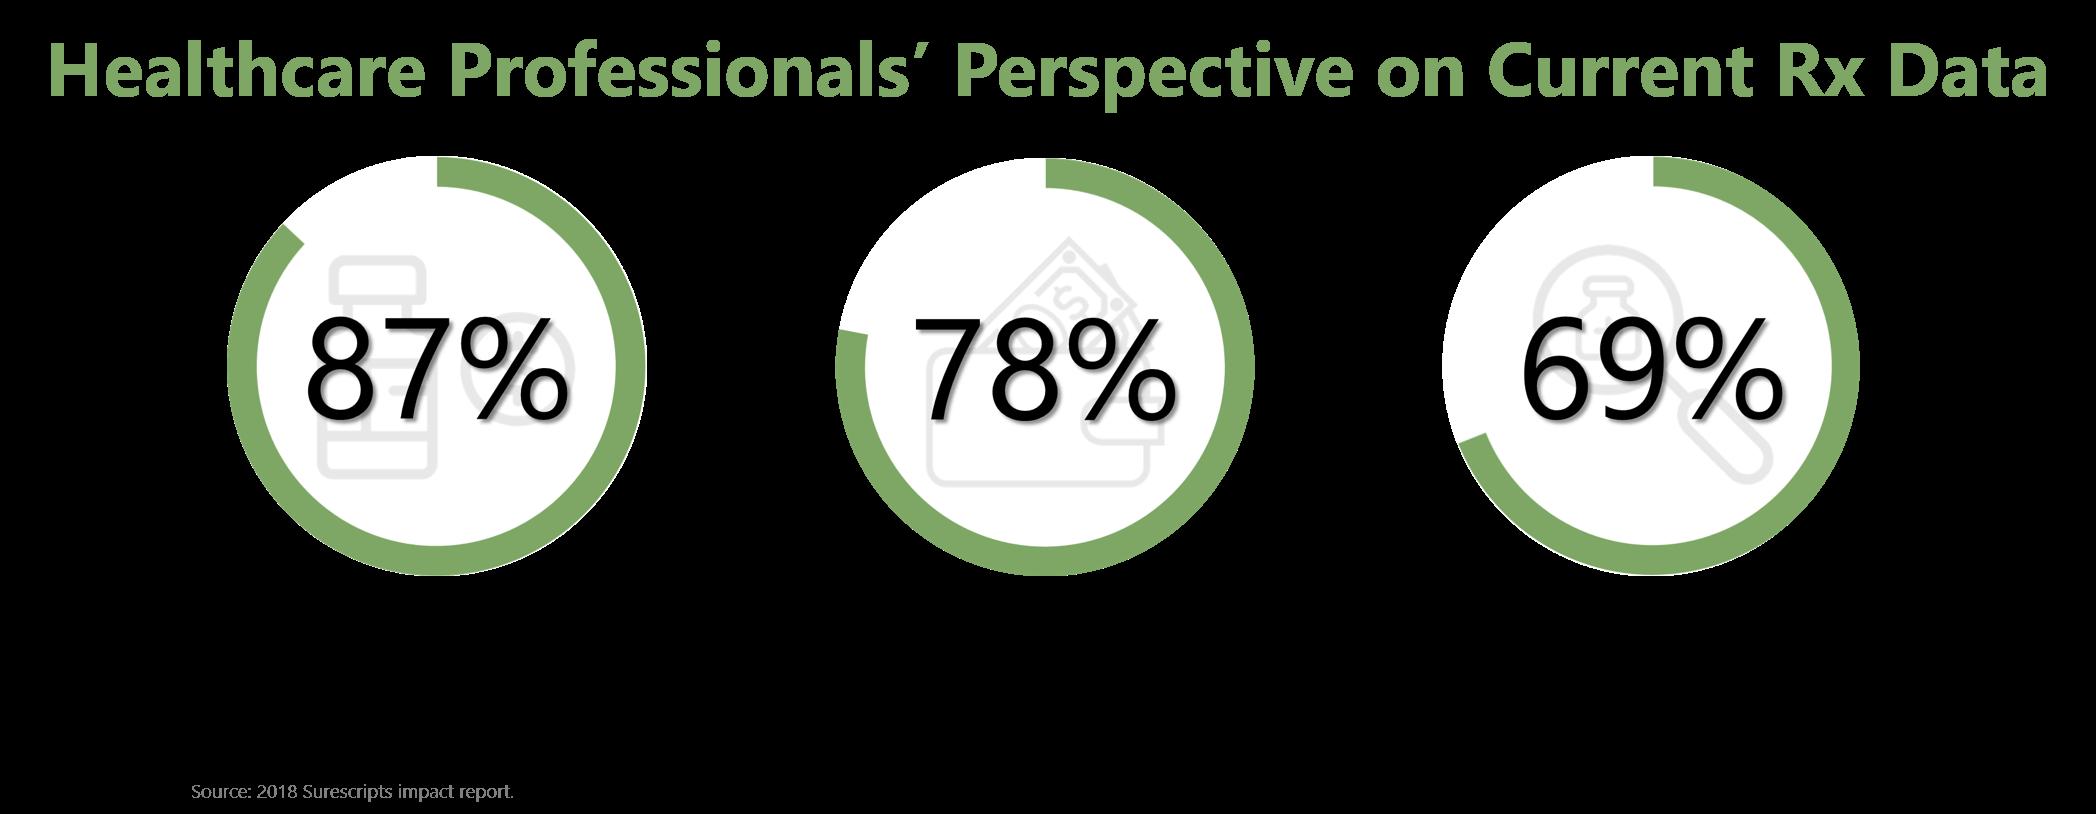 Healthcare Professionals Perspective Current Prescription Data.png